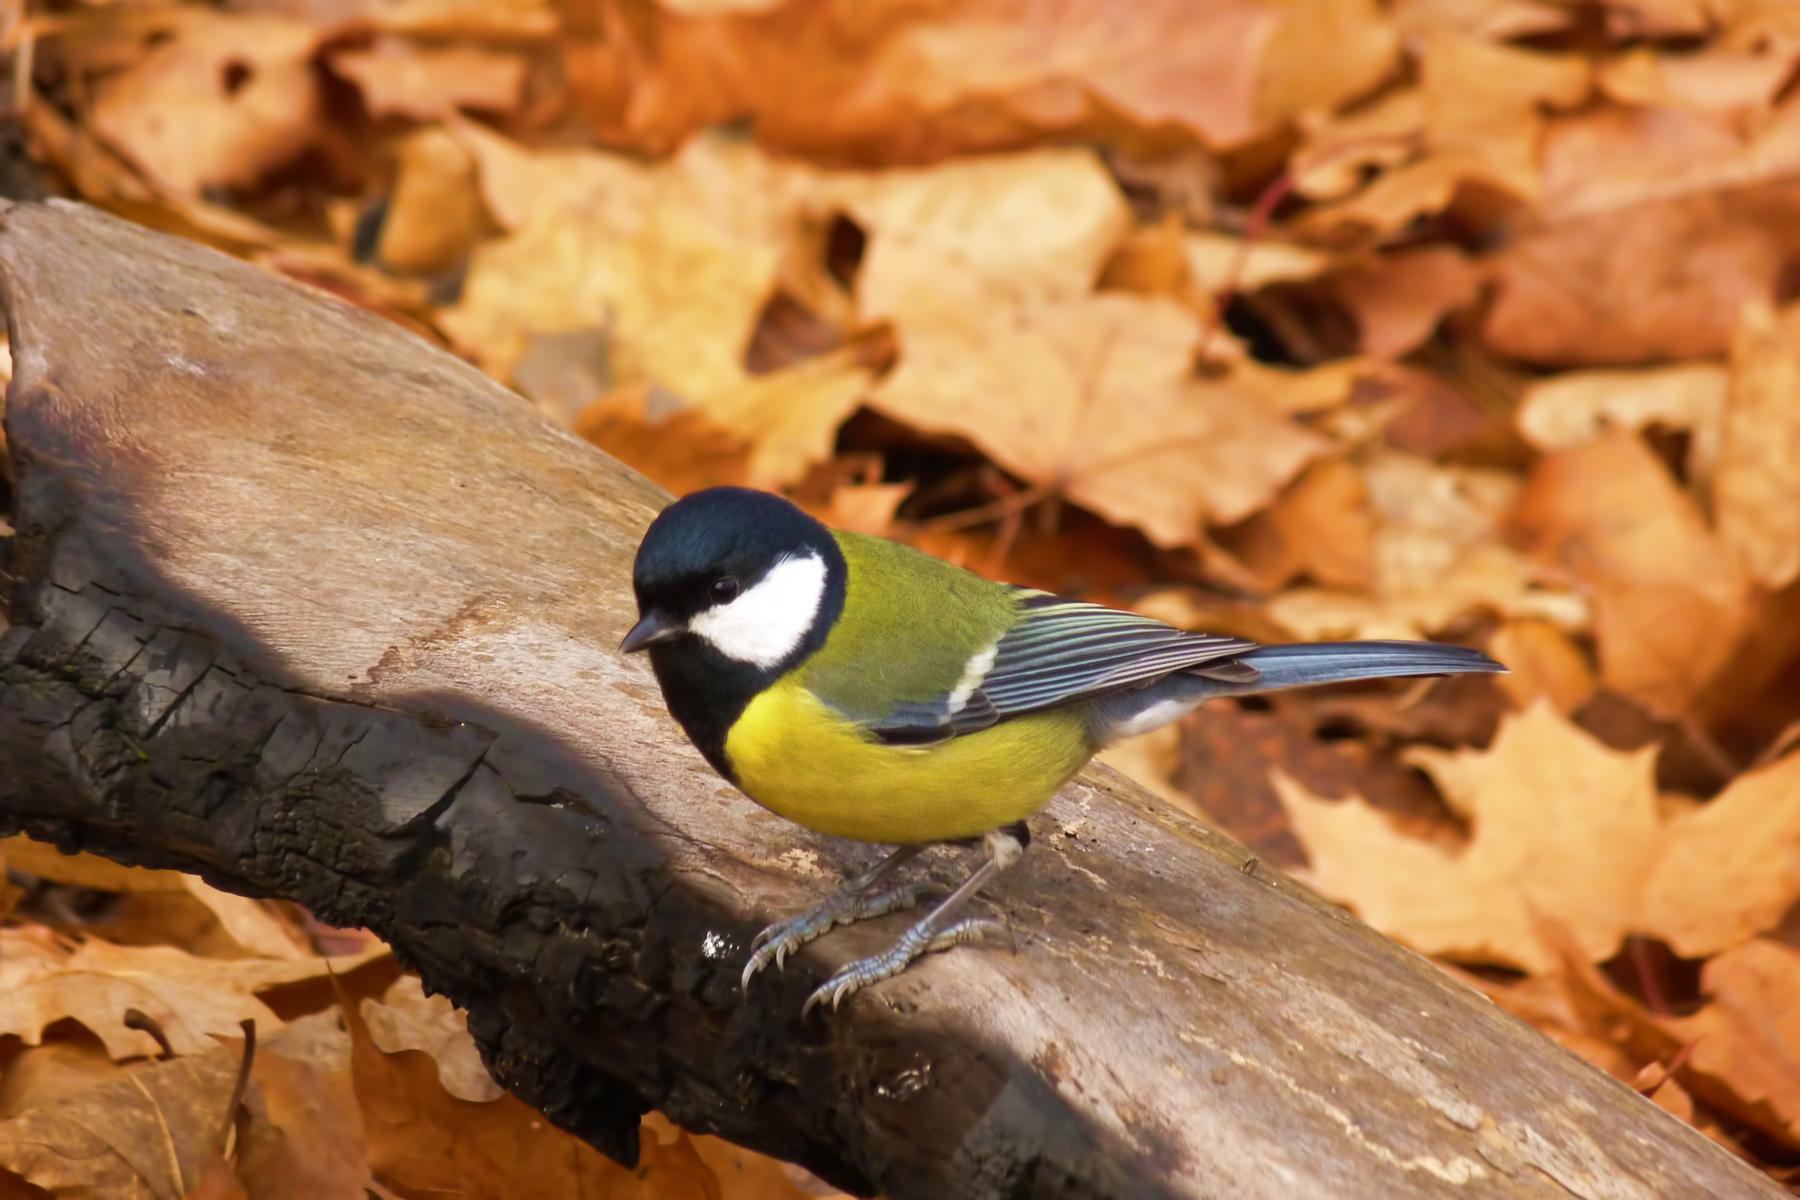 bird, Animal, Autumn, Blurred, Colorful, HQ Photo